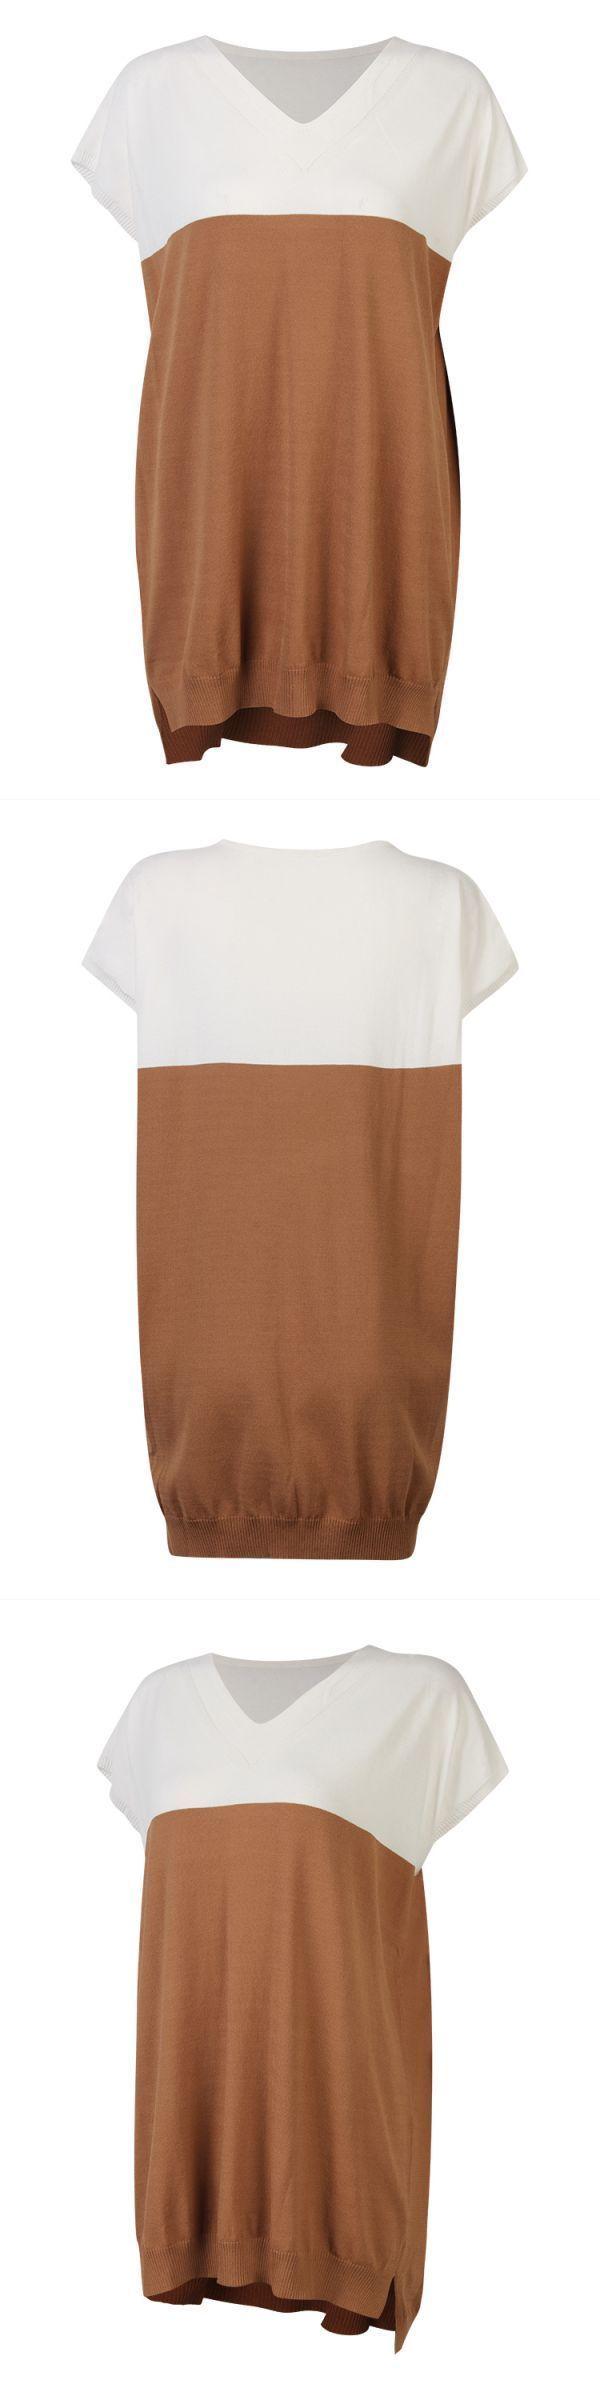 Women short sleeve v-neck knit pullover loose patchwork shirt dress hanes women#8217;s t shirts #3 #4th #sleeve #t #shirts #womens #polo #t #shirts #womens #online #roadkilltshirts #girl #model #womens #kiss #t #shirts